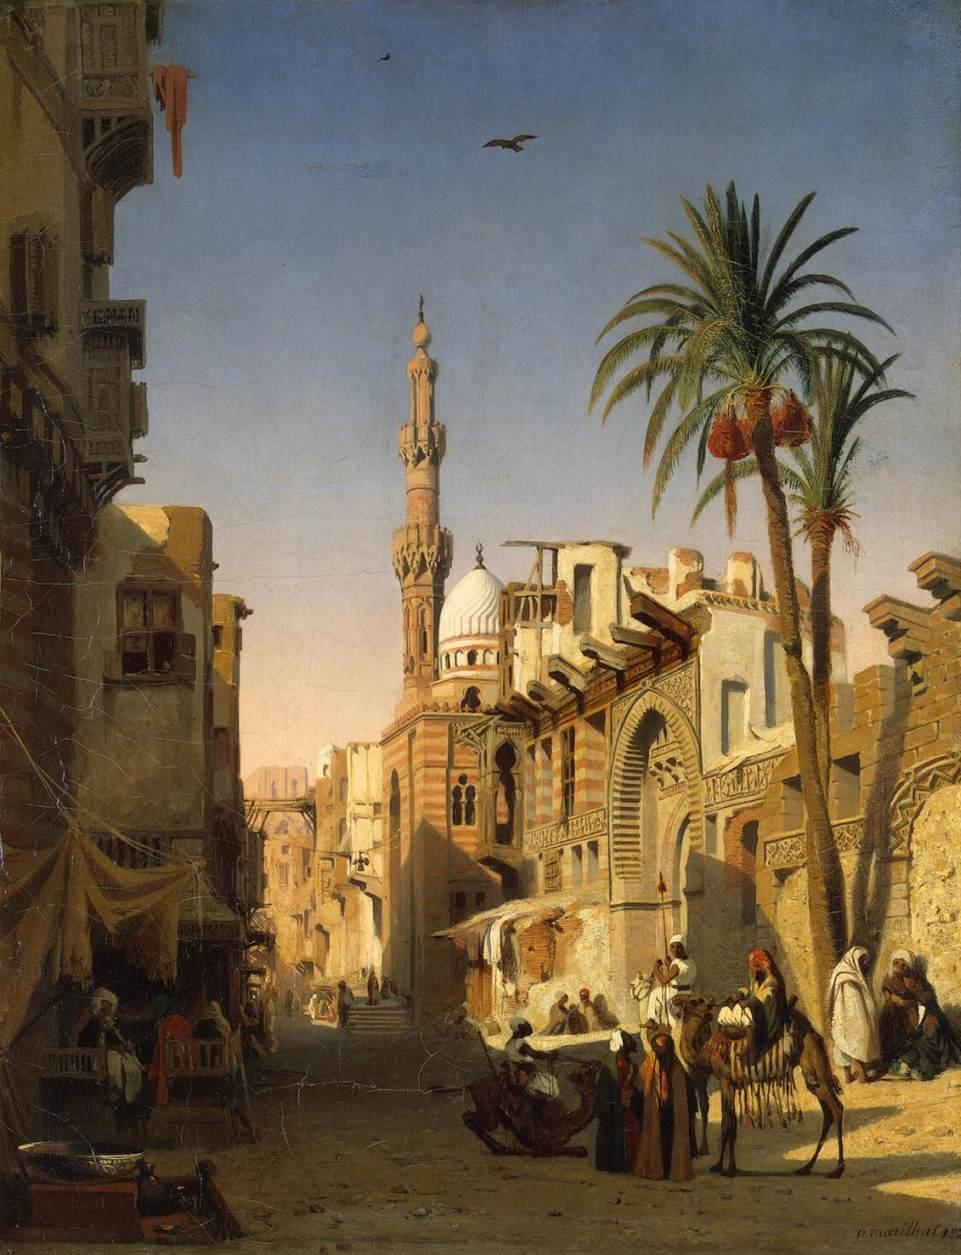 Figure 6. Prosper Marilhat, Ezbekiyah Street in Cairo, 1833, oil on canvas, 54 x 42 cm, The Hermitage, St. Petersburg.